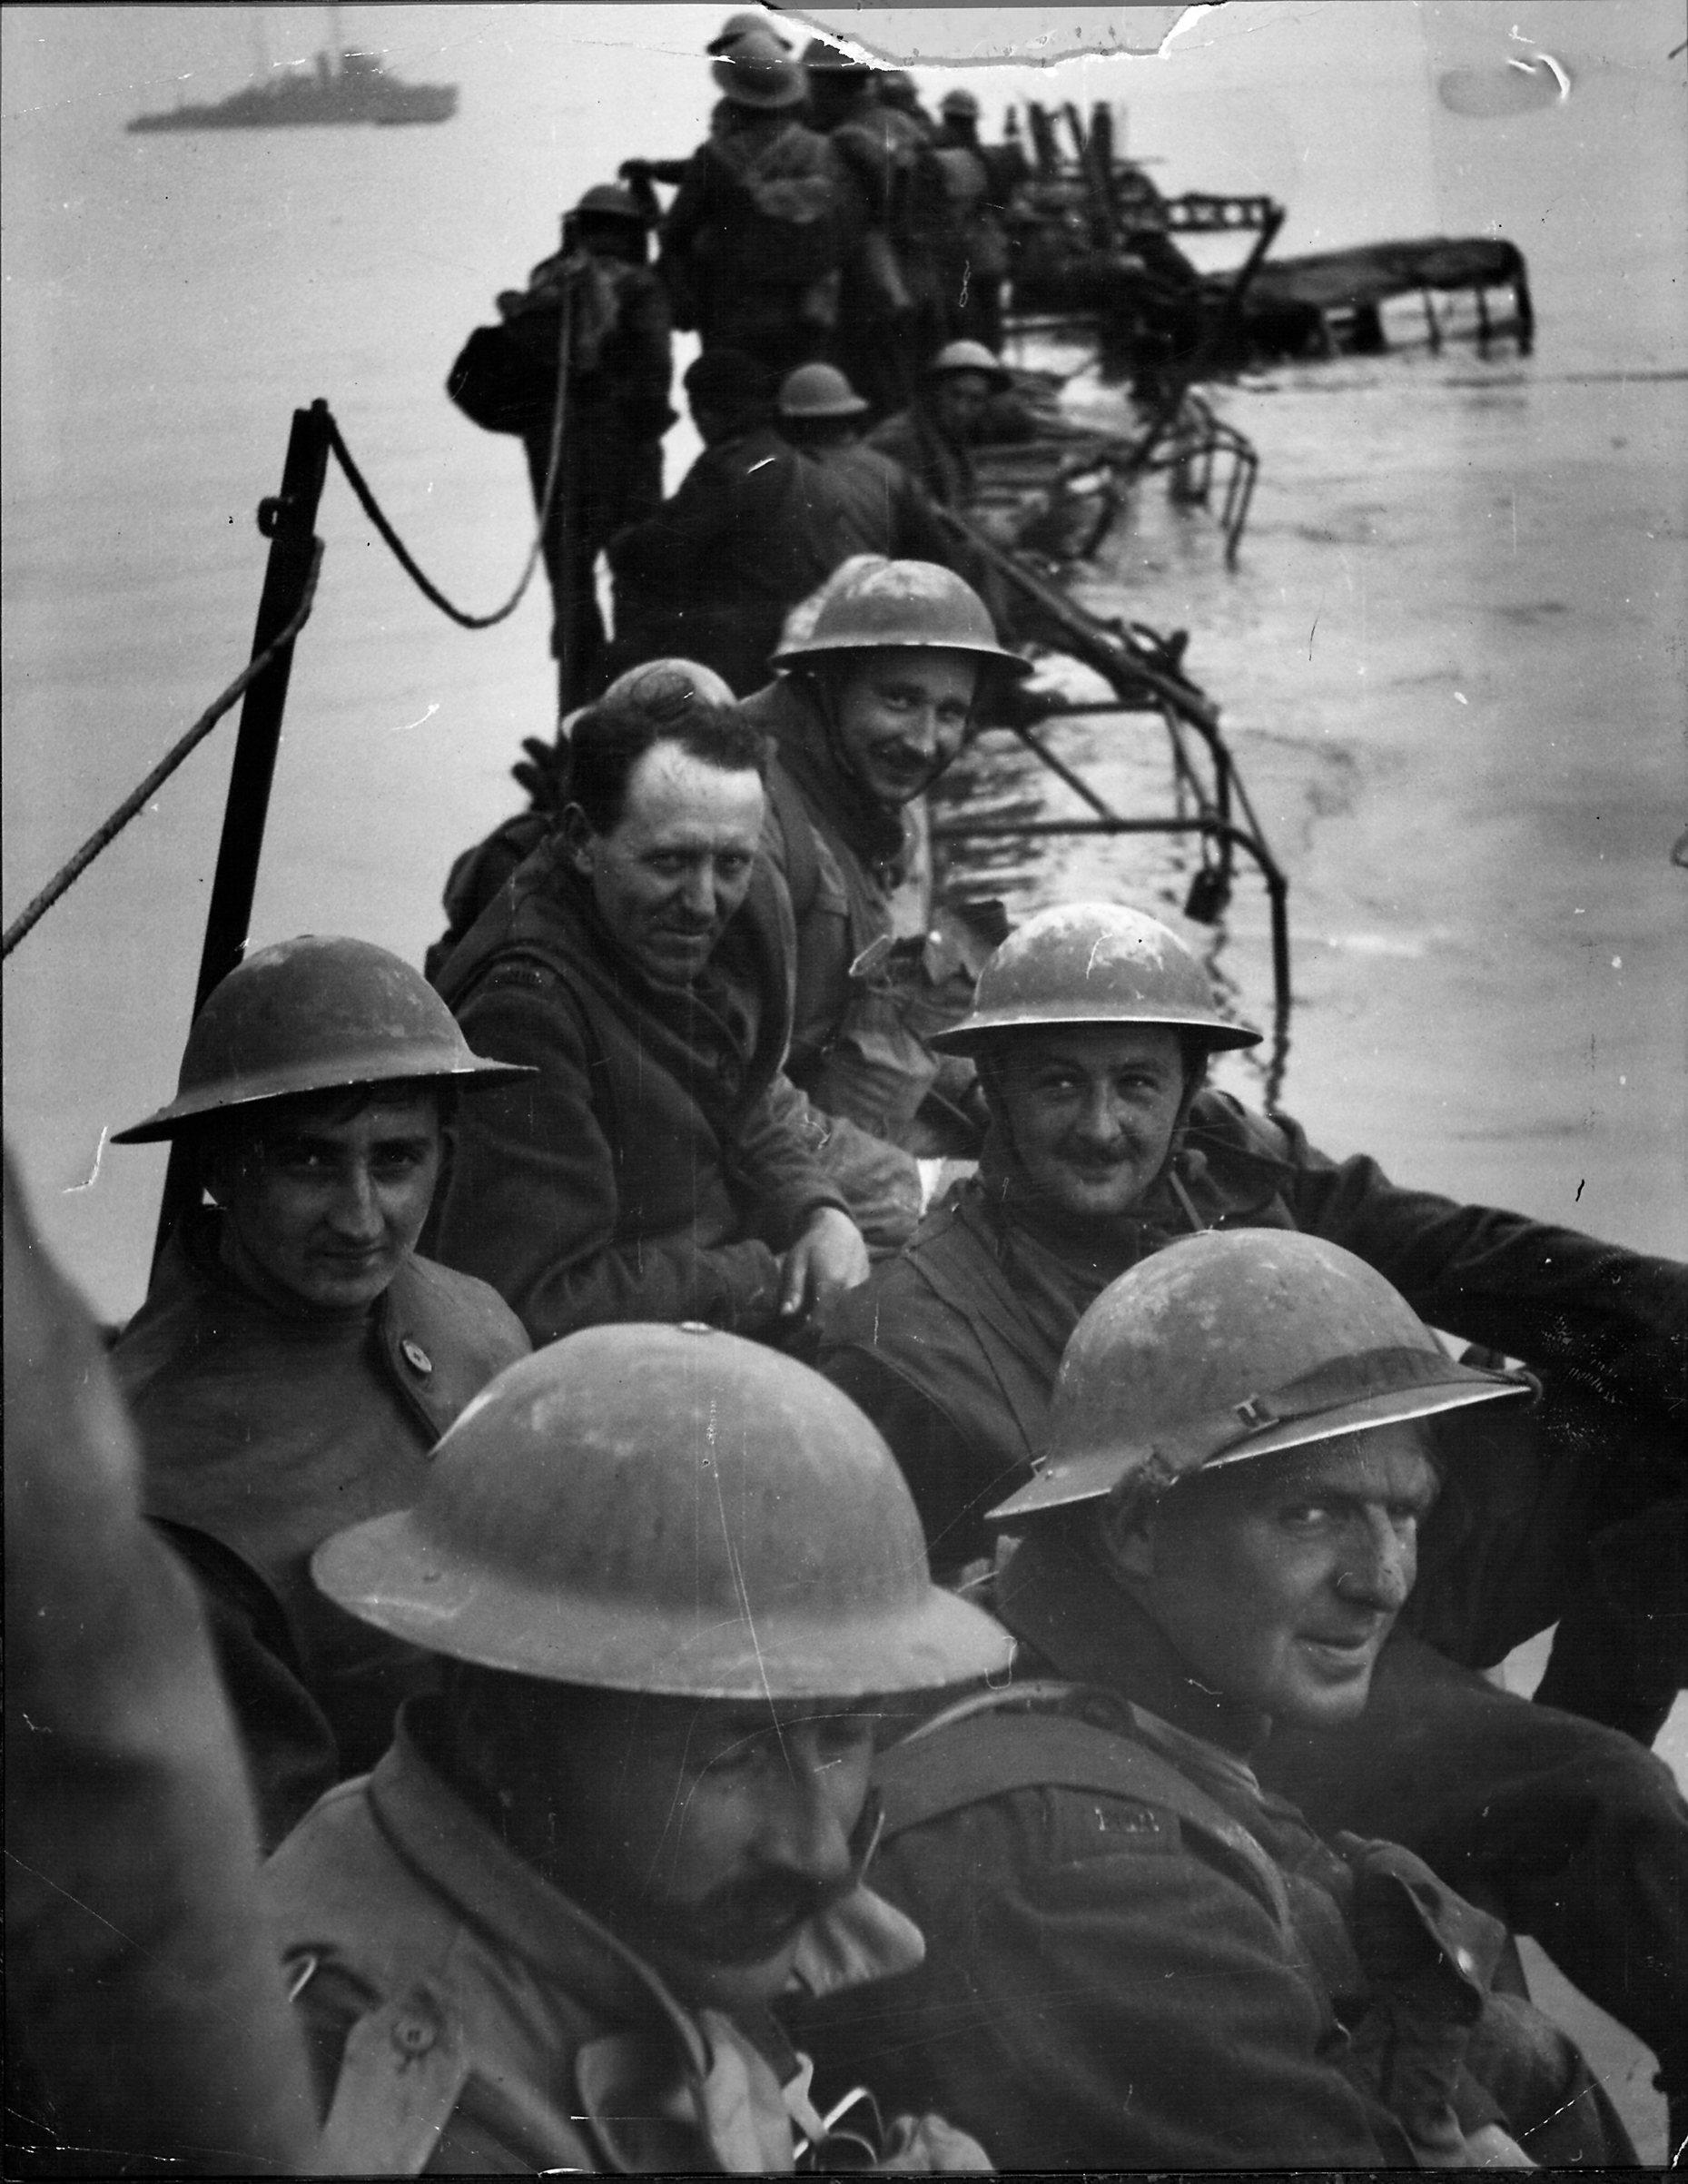 Members of Royal Ulster Rifles waiting on improvised pier of lorries to evacuate Dunkirk during low tide.